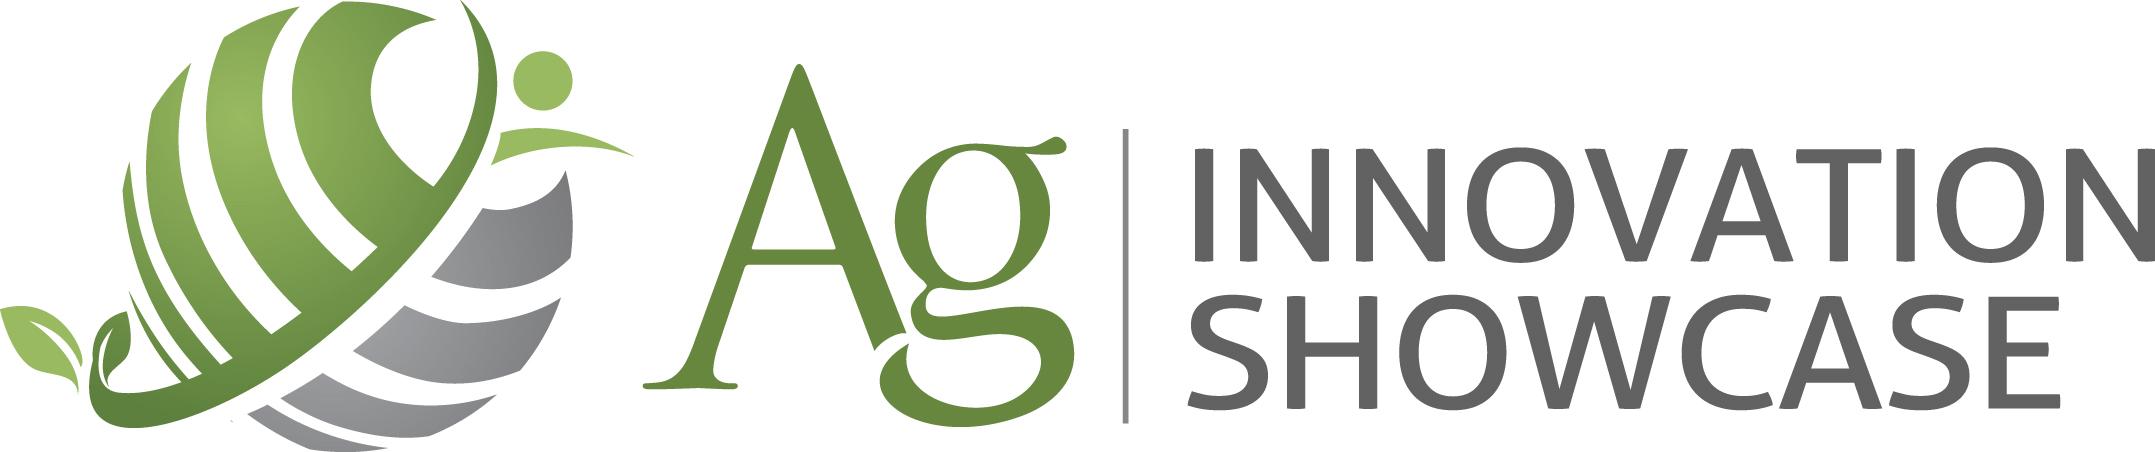 Ag-Innovation-Showcase-Logo